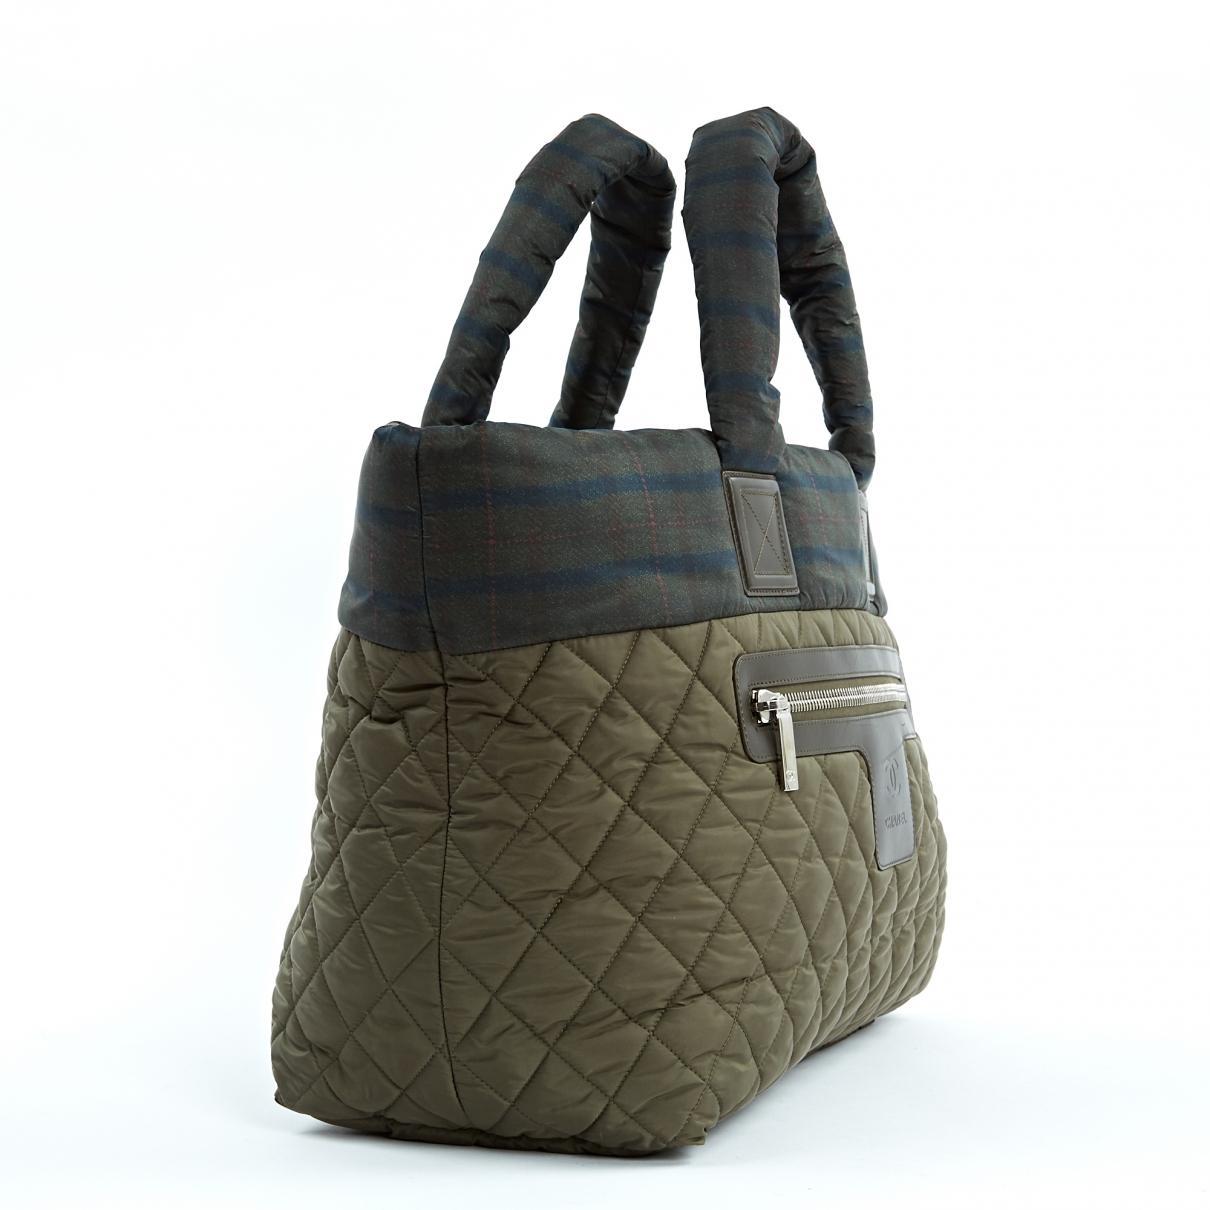 cb37b81cc93e Chanel - Multicolor Coco Cocoon Khaki Synthetic Handbag - Lyst. View  fullscreen